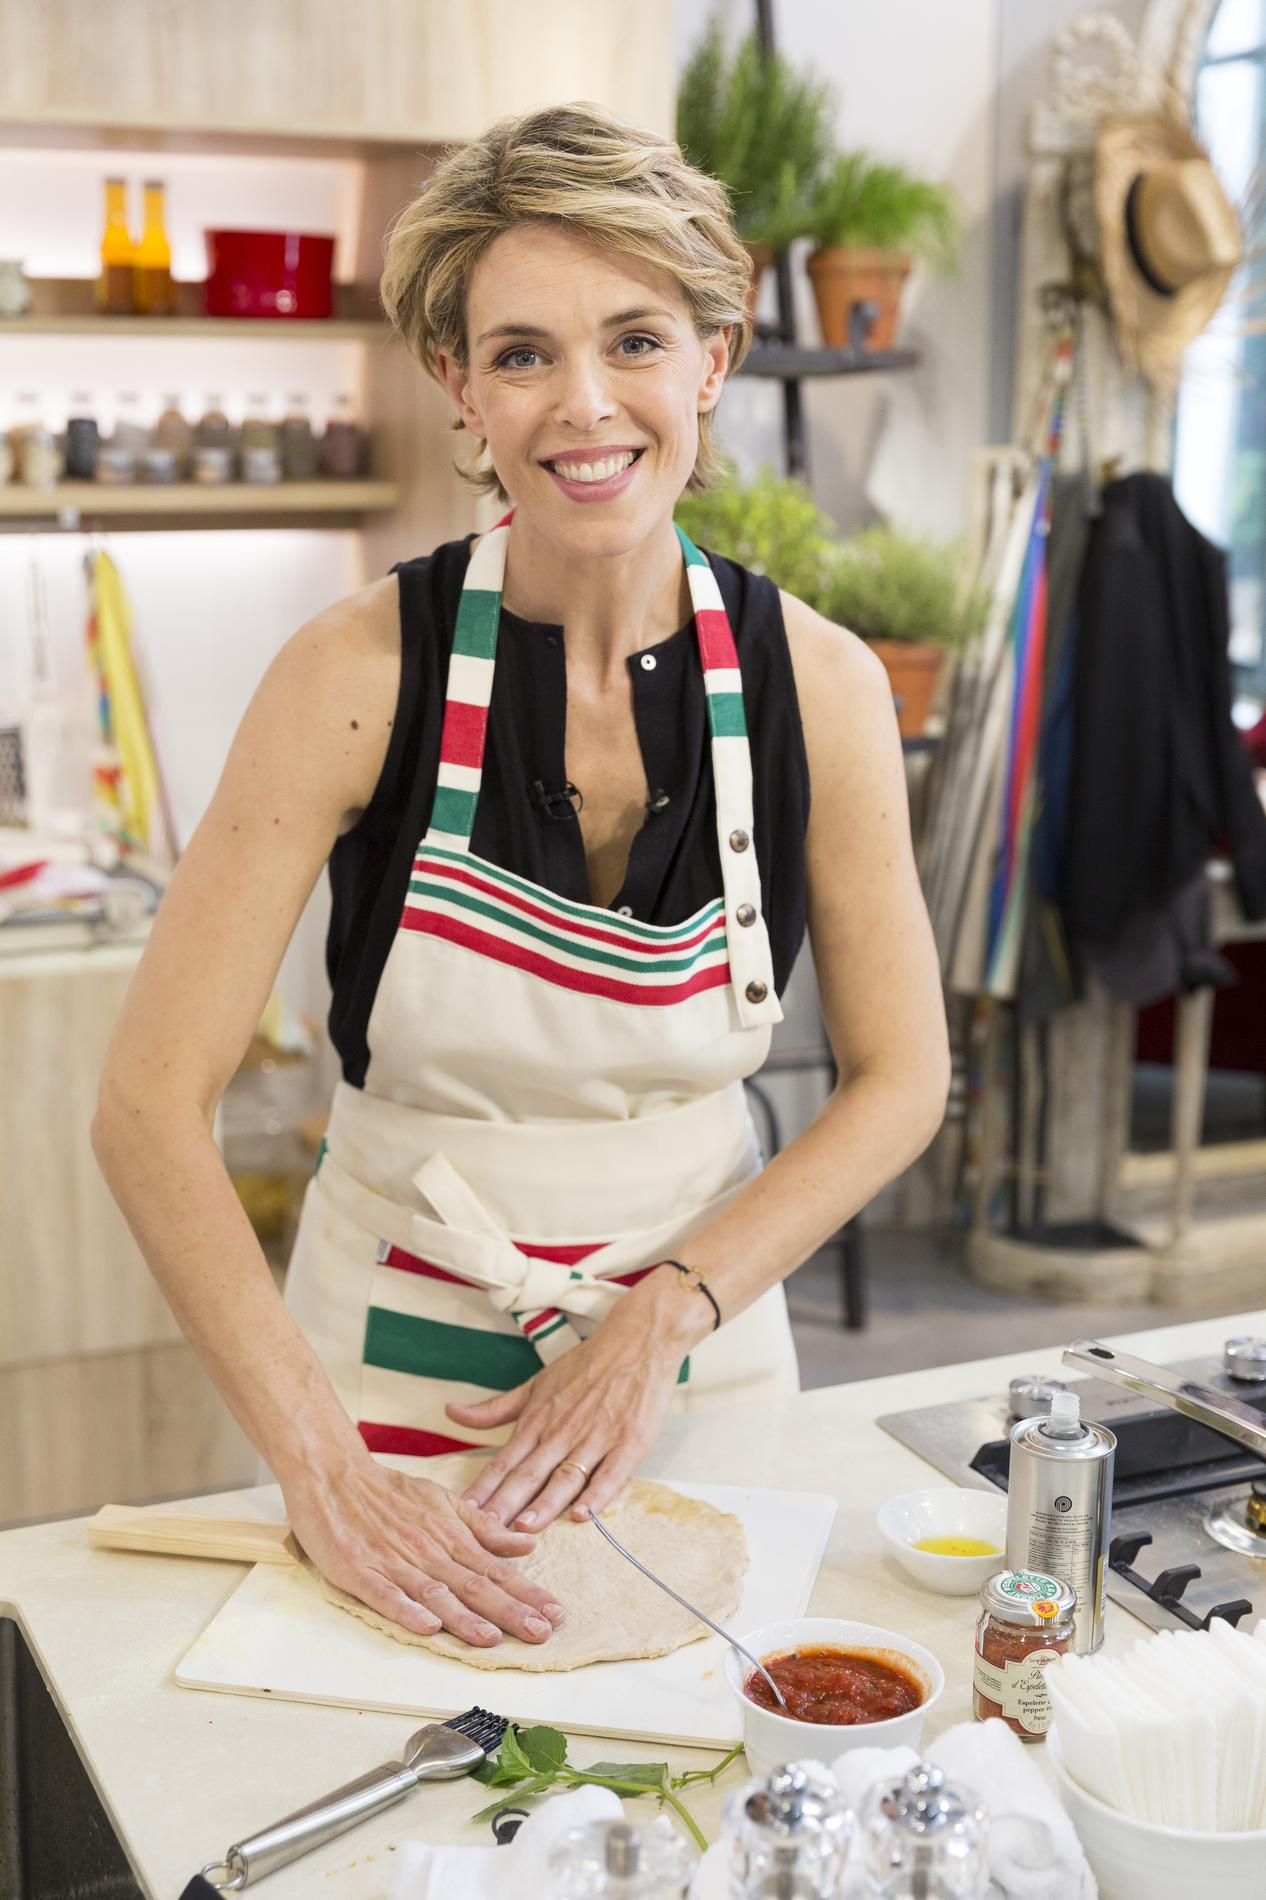 Julie andrieu madame figaro - Cuisine de julie andrieu ...